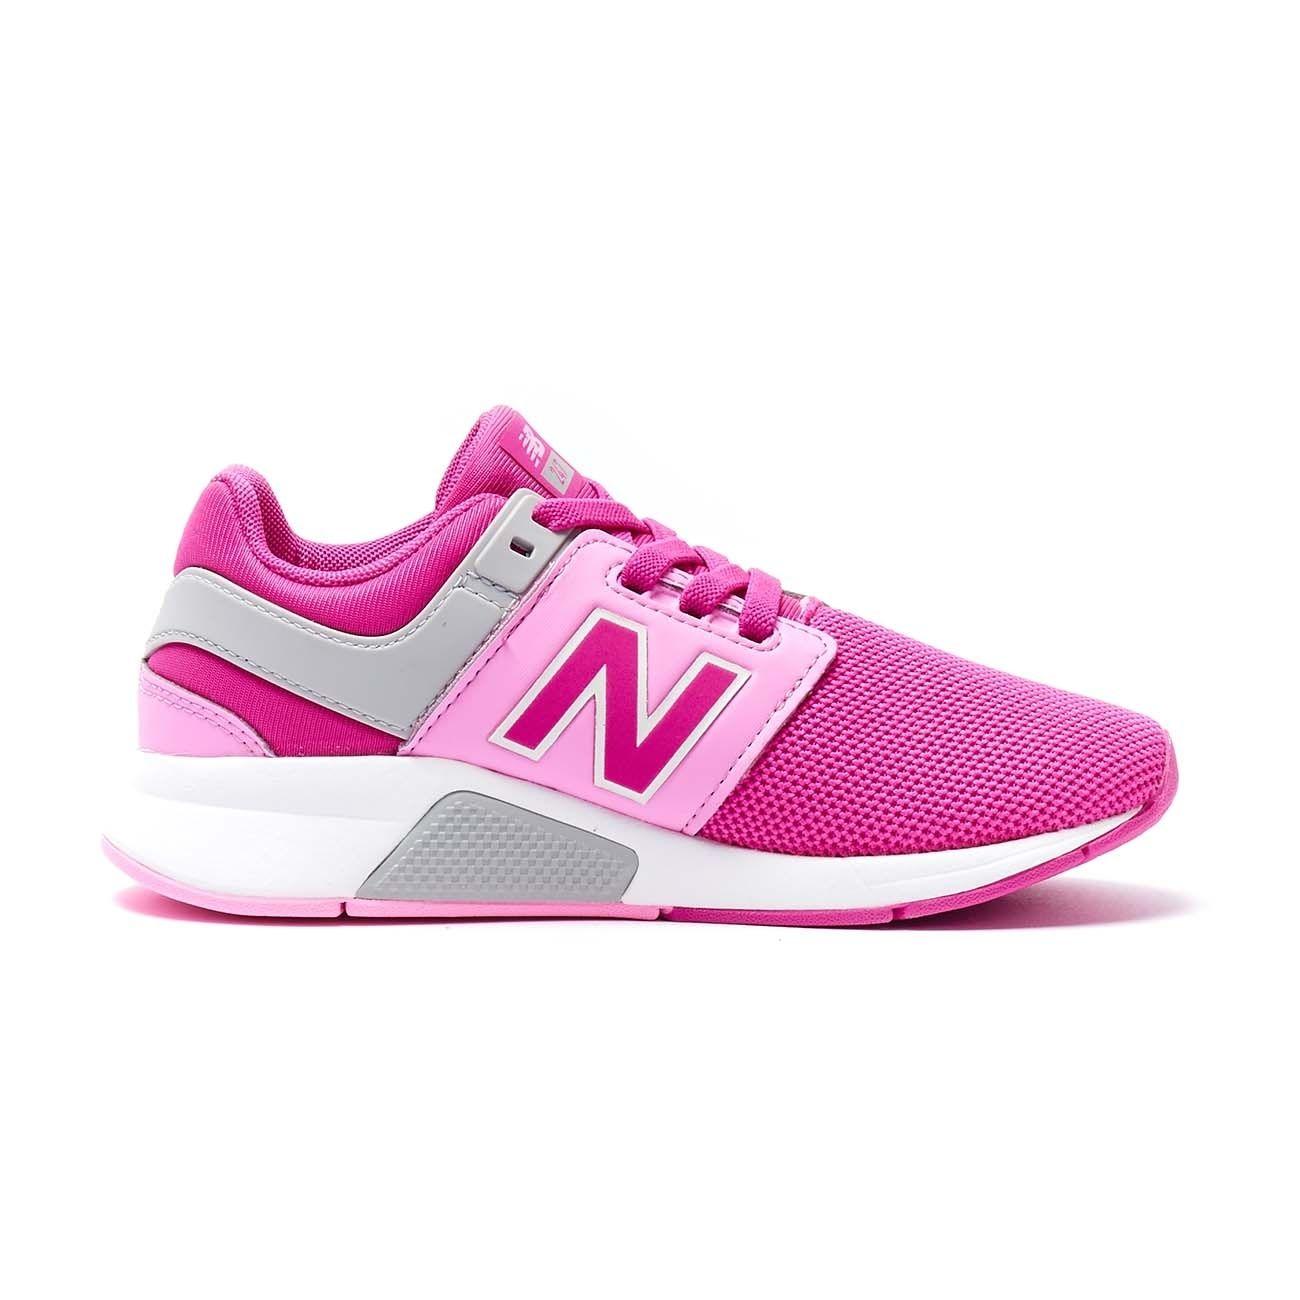 NEW BALANCE SNEAKERS 247 LIFESTYLE SYNTHETIC MESH Bambino Pink ...